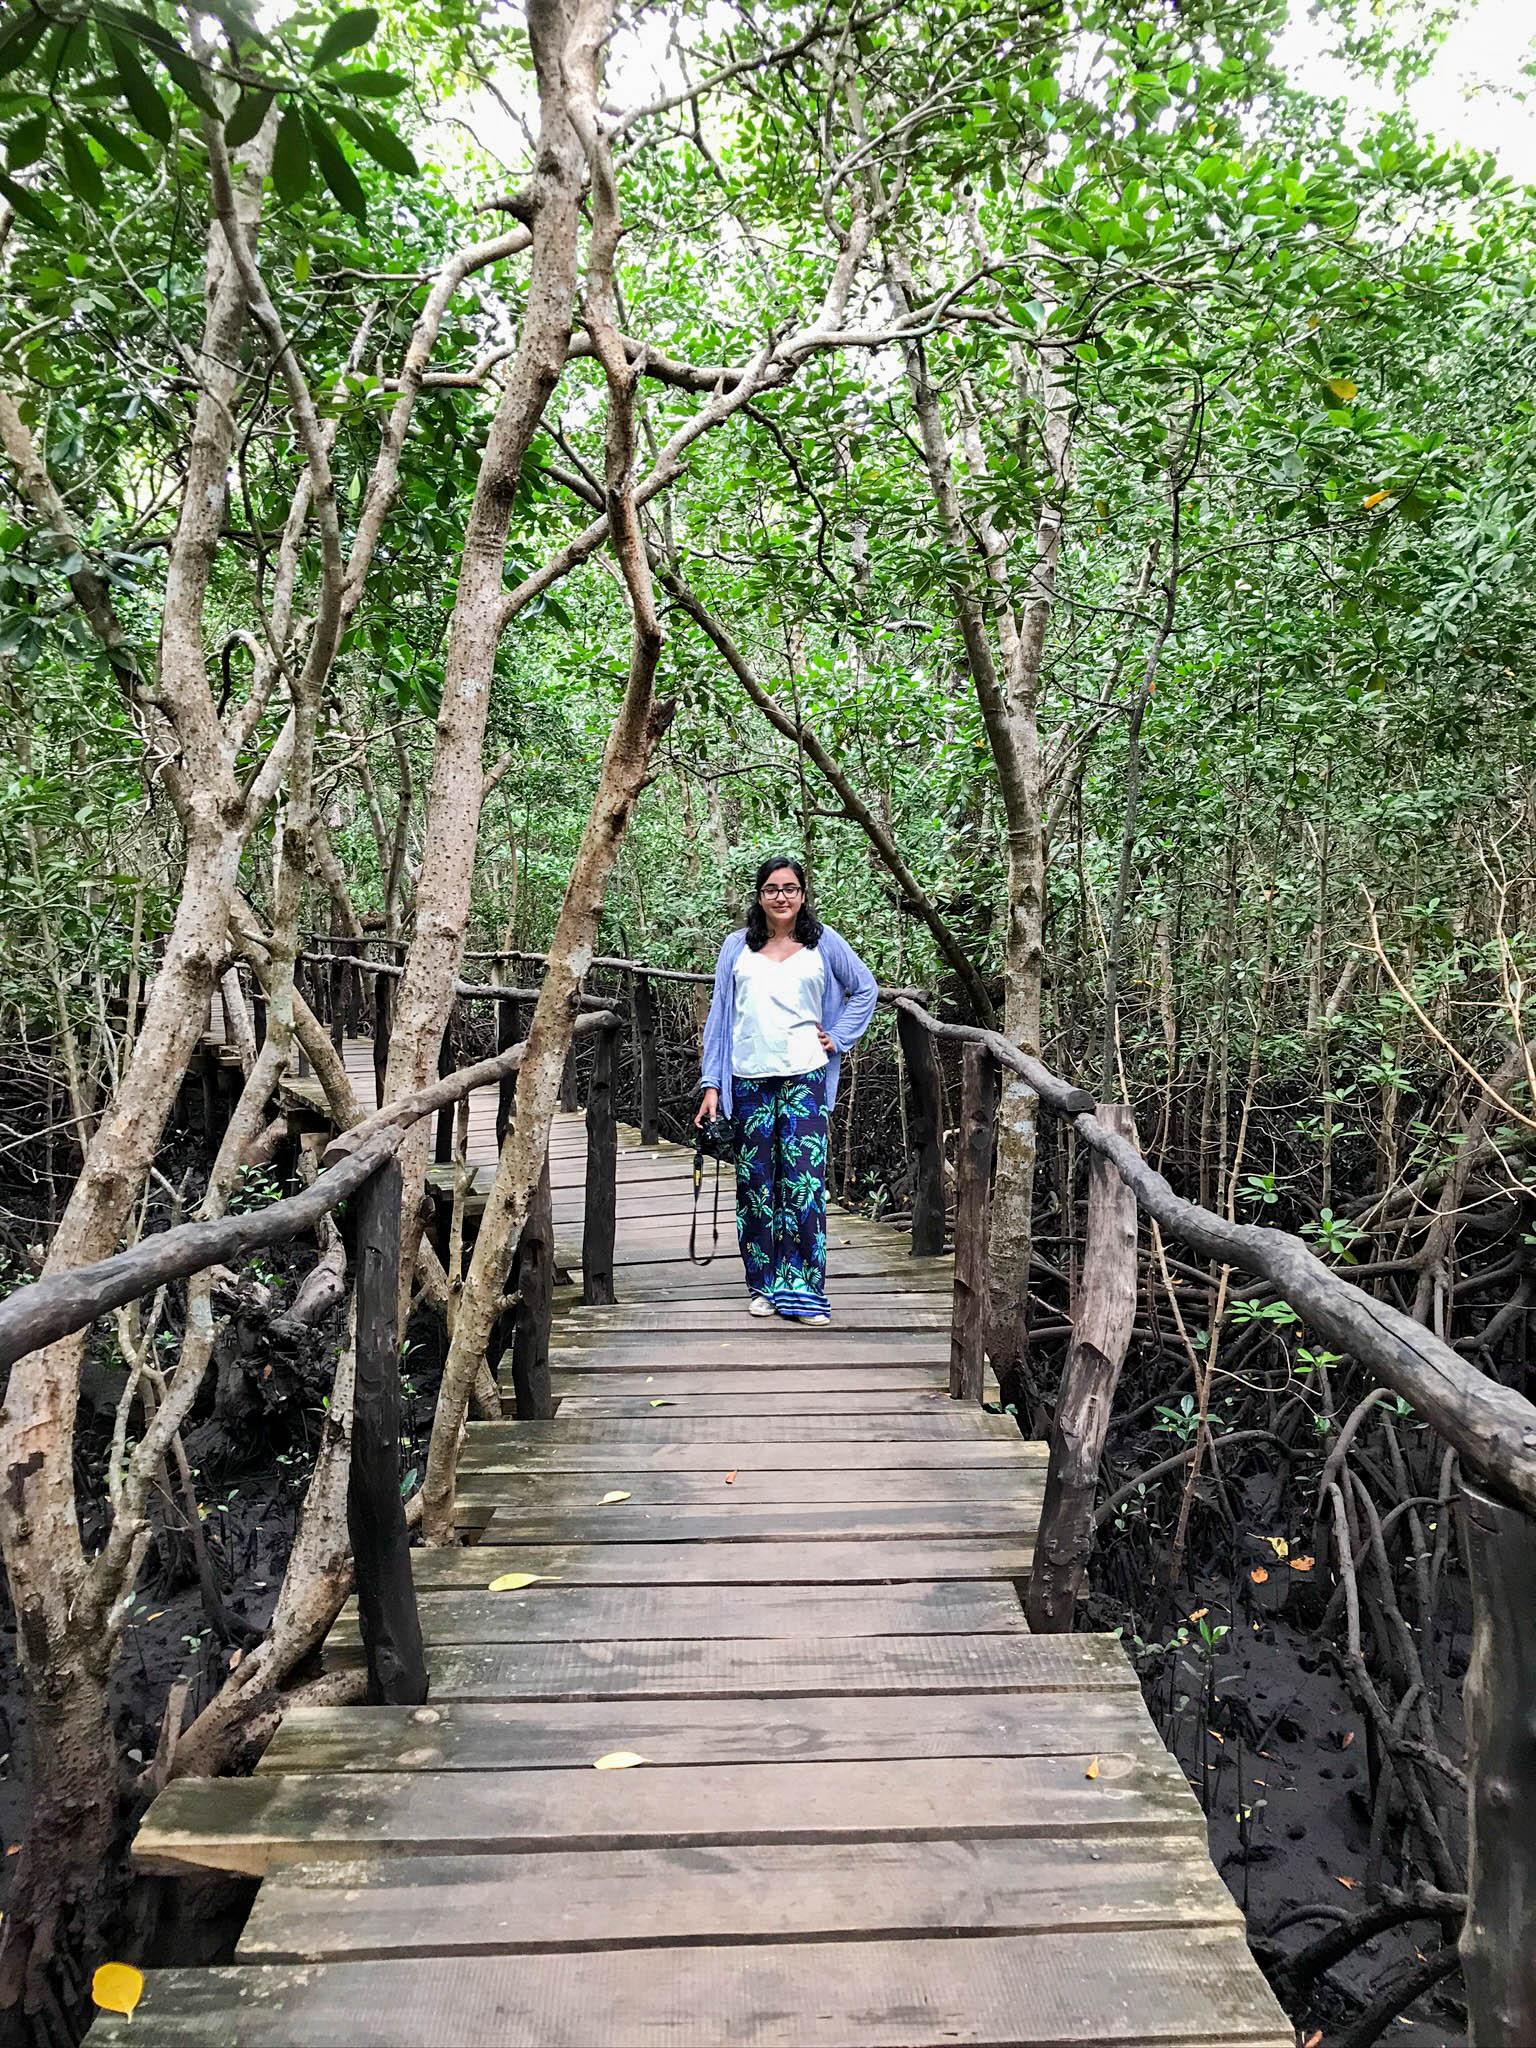 Exploring The Mangroves, Jozani Forest, Zanzibar, Tanzania